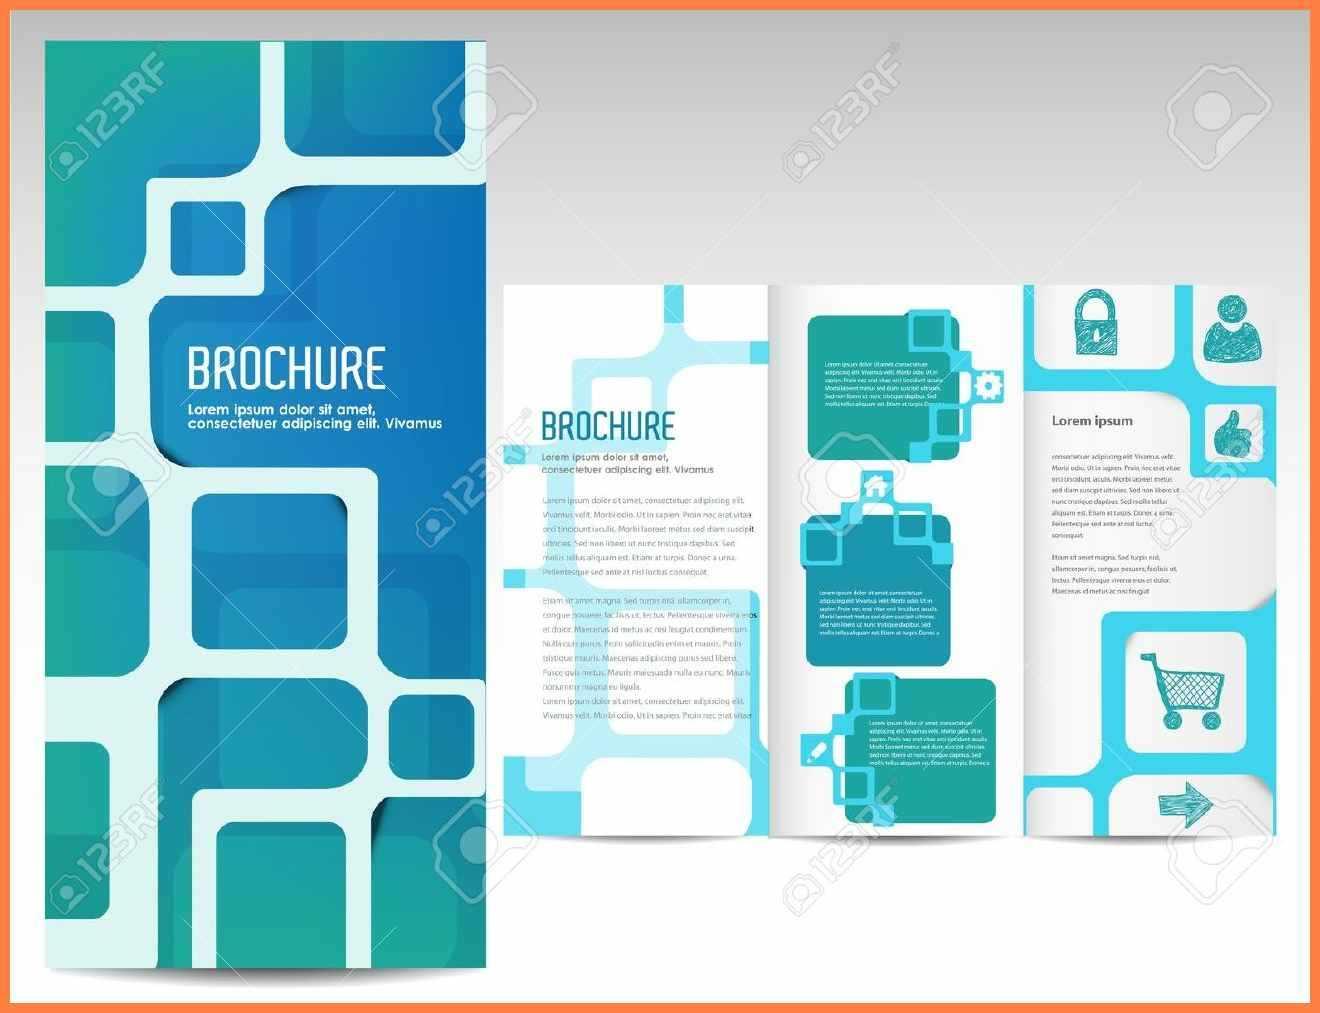 001 Free Microsoft Word Tri Fold Brochure Templates Template With Regard To Free Tri Fold Brochure Templates Microsoft Word